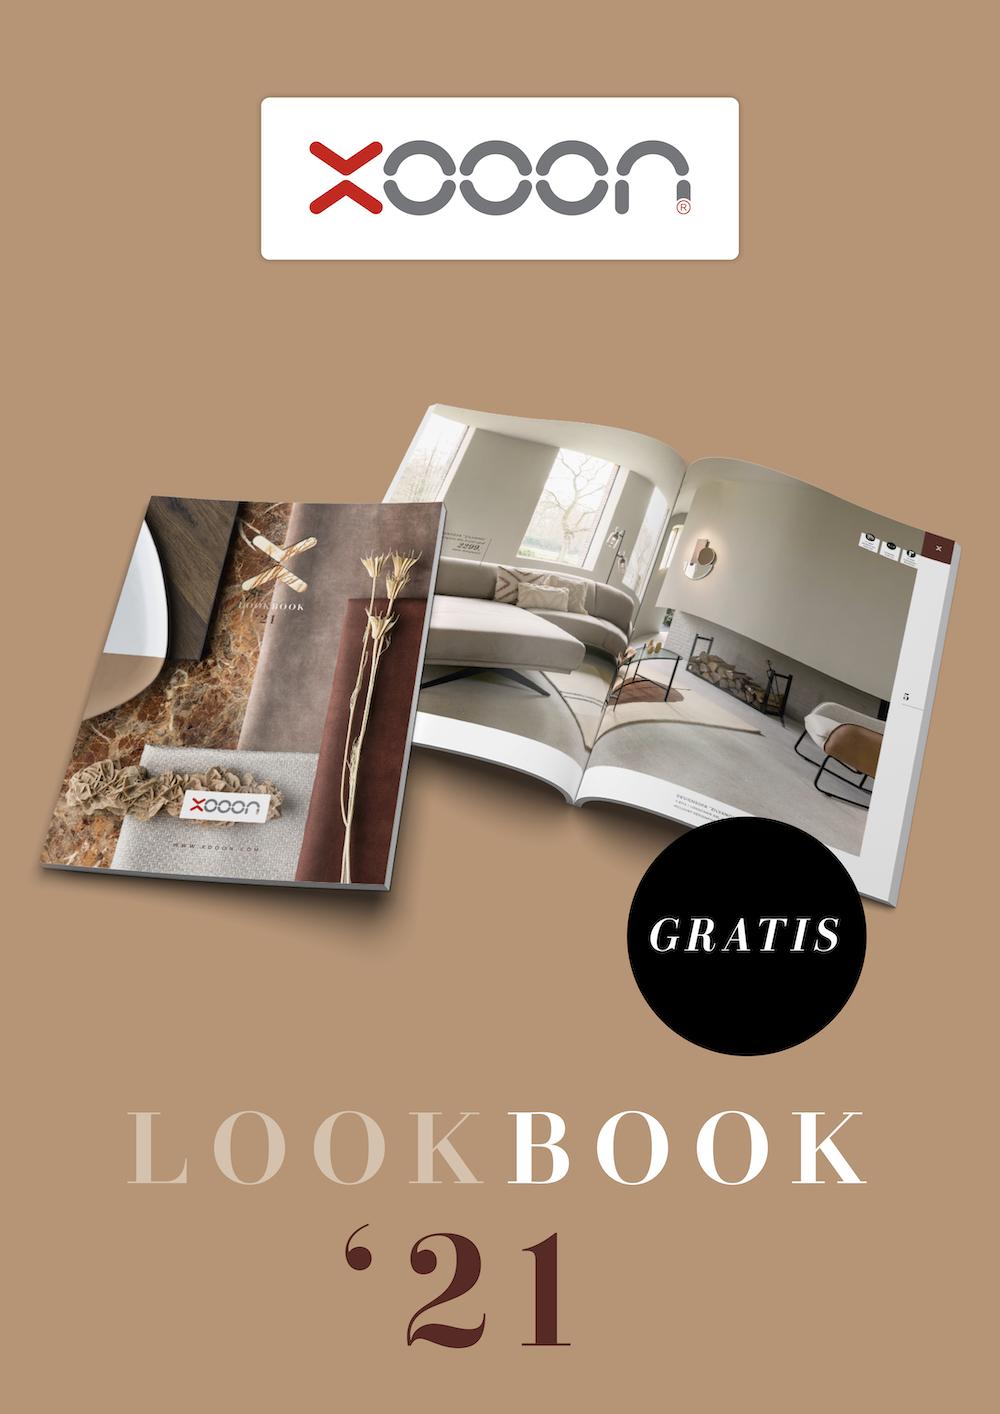 Xooon lookbook 2021 #xooon #lookbook #interieur #inspiratie #meubels